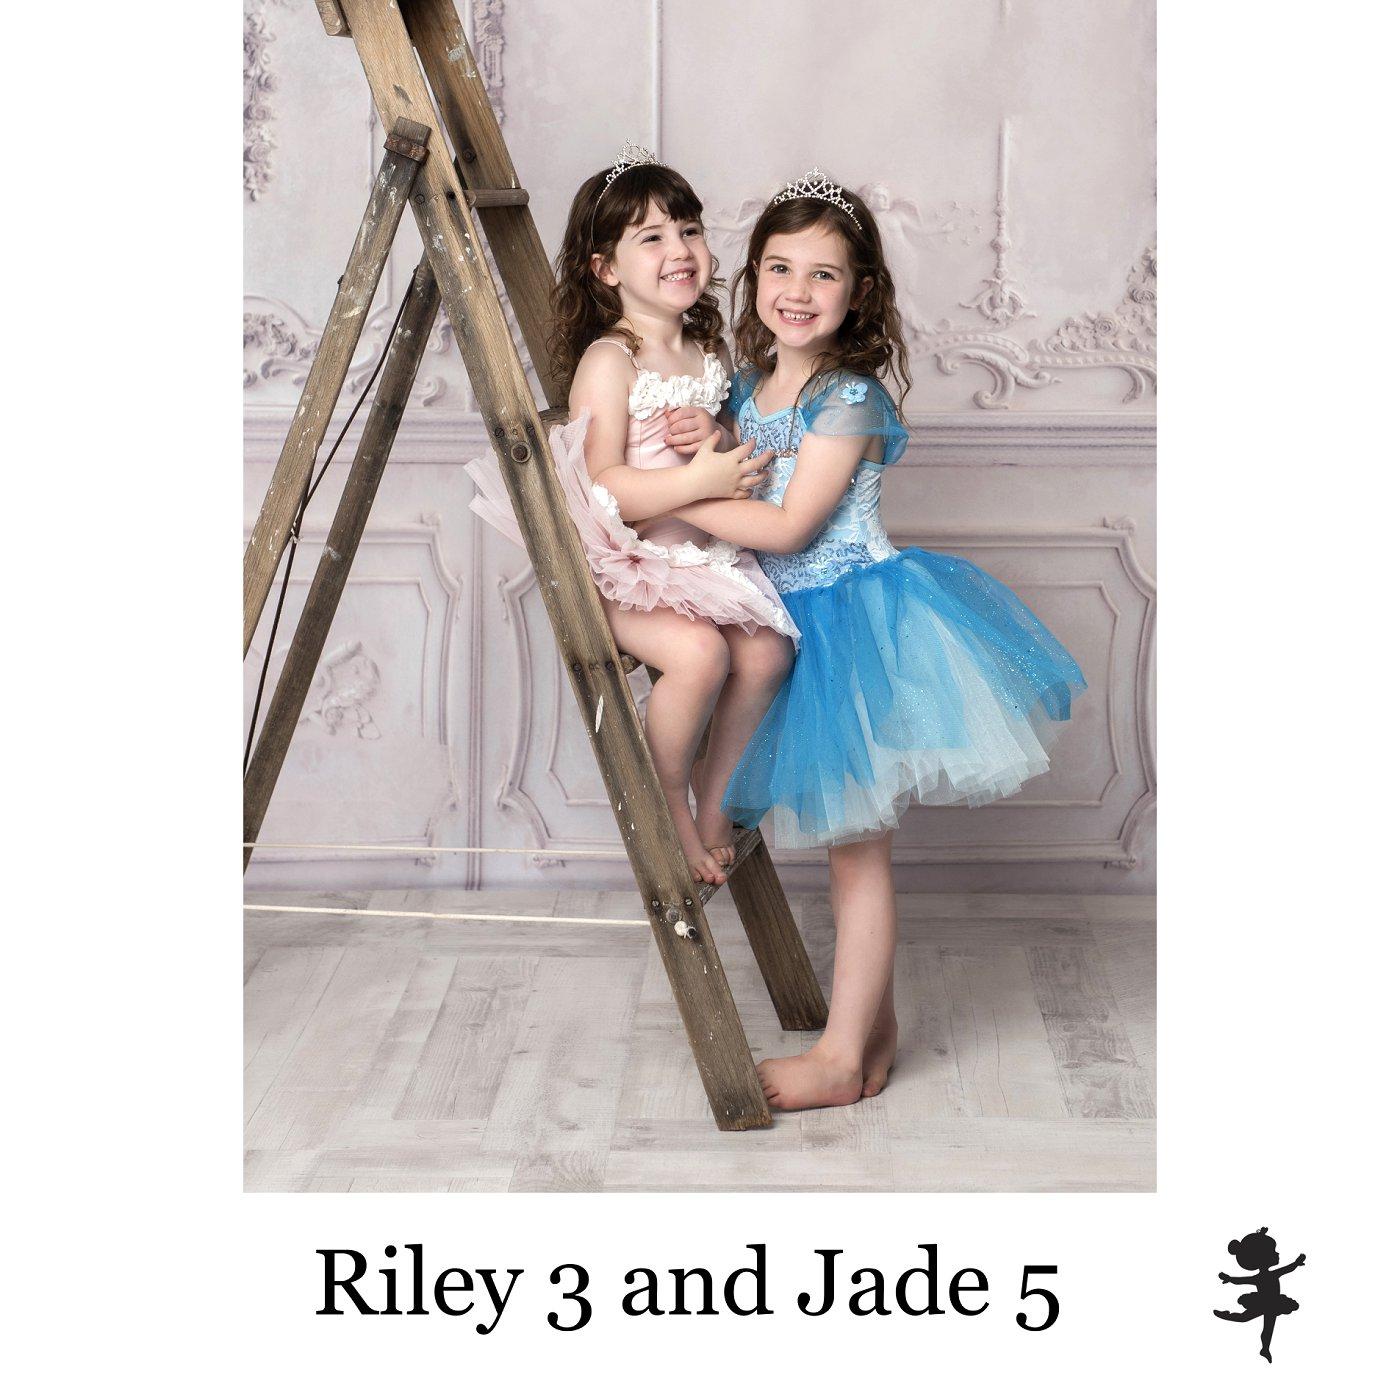 LB6719- Riley 3 and Jade 5.jpg